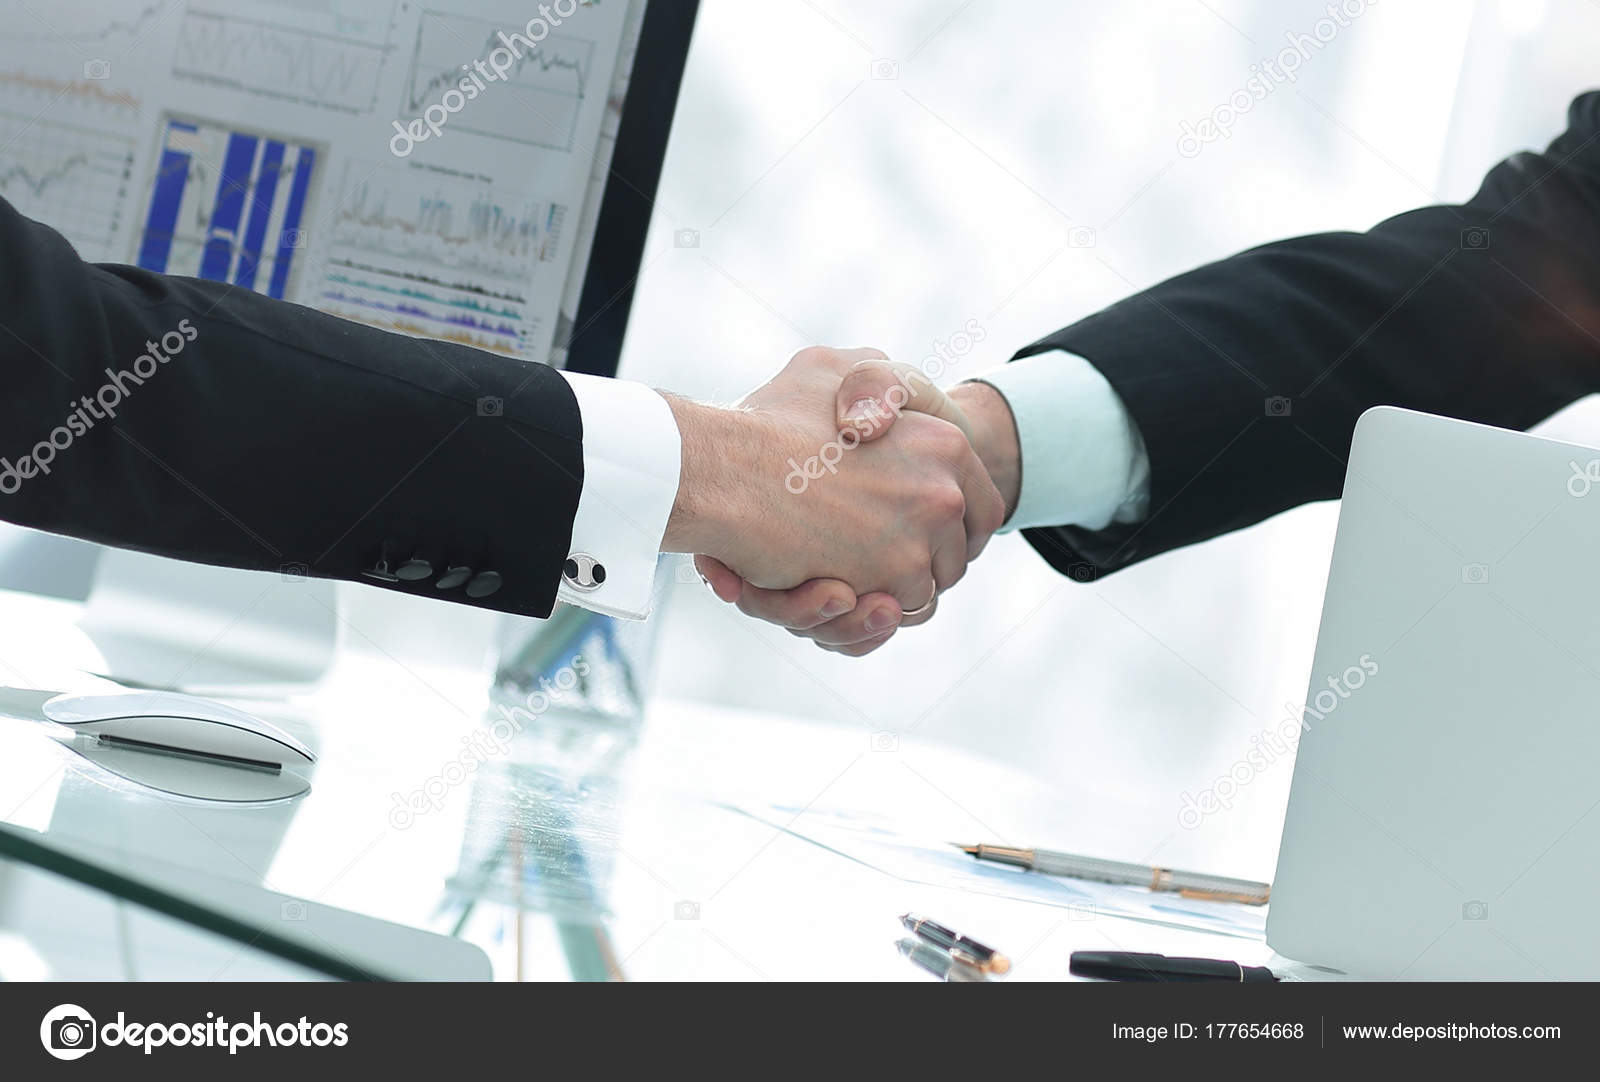 Geschäftsmann begrüßt Business Partner Hände schütteln — Stockfoto ...